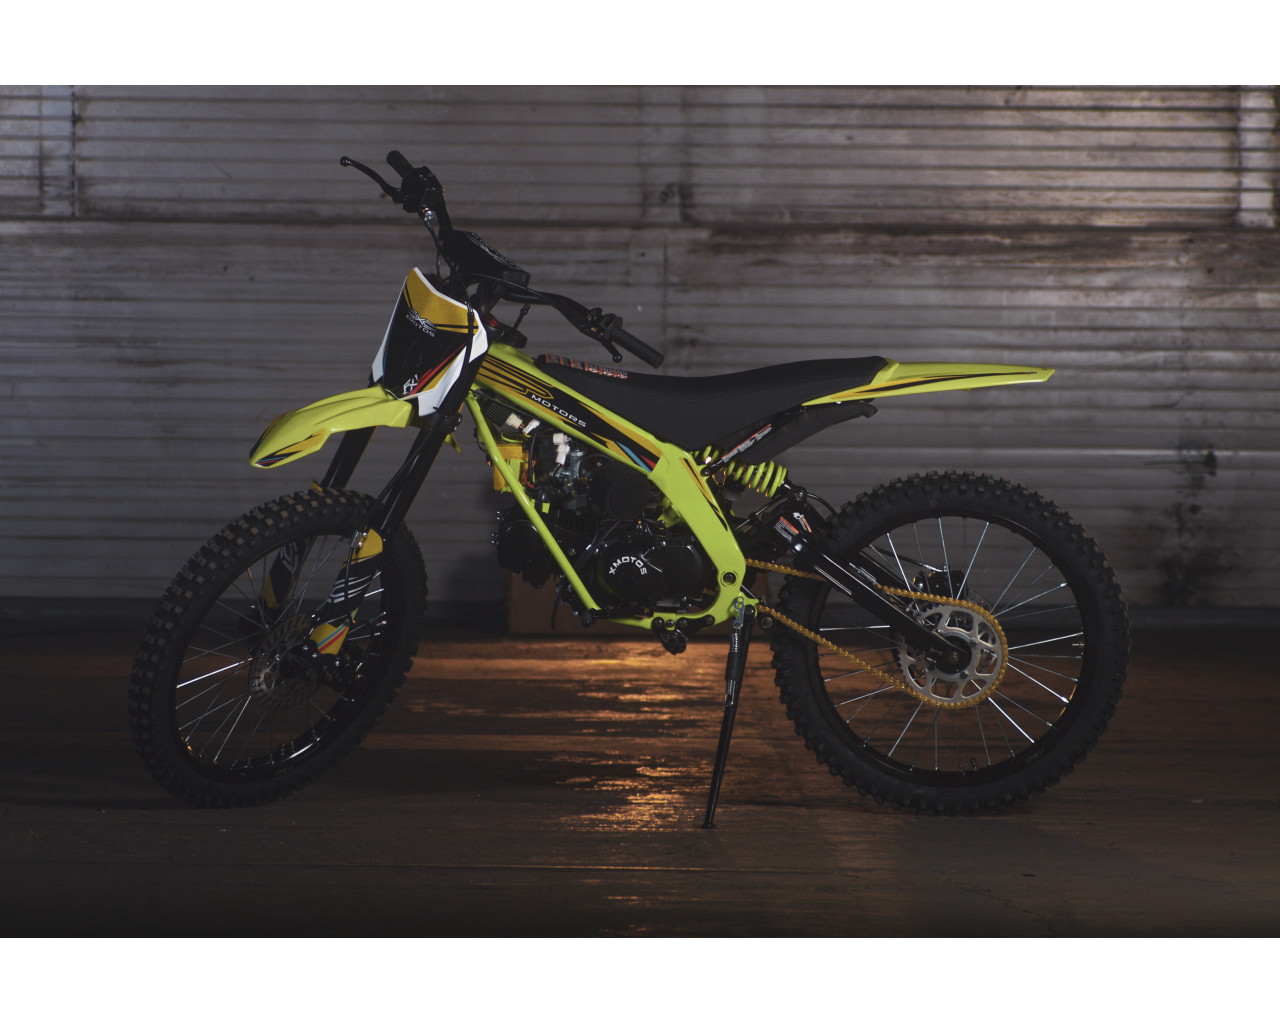 Xmotos FX1 125cc